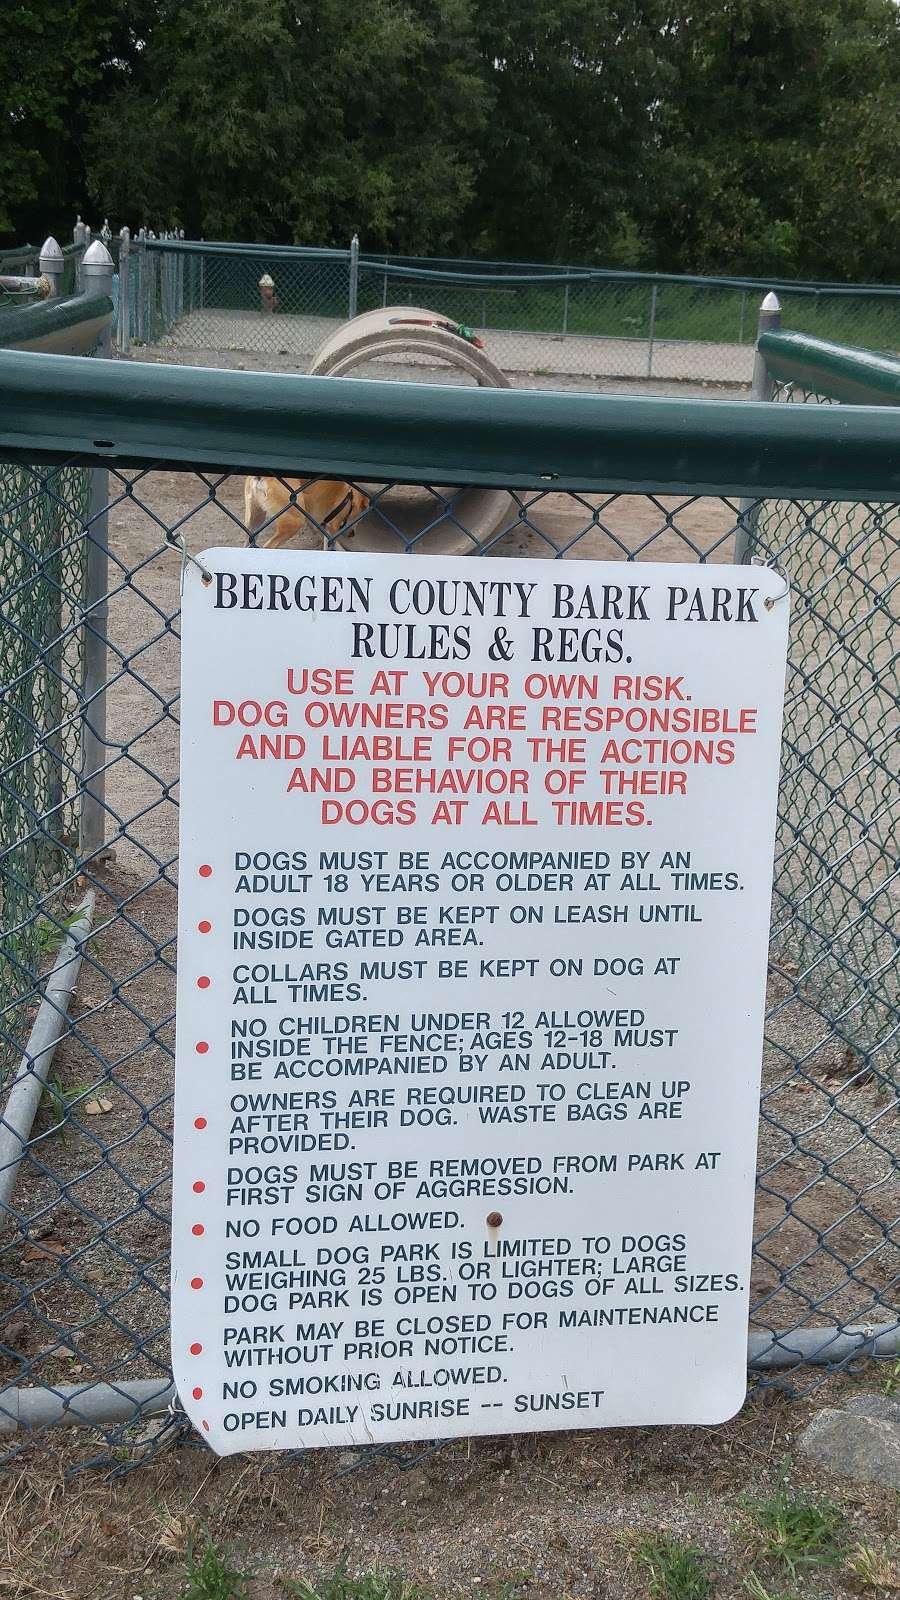 Overpeck Dog Park - park    Photo 7 of 7   Address: Leonia, NJ 07605, USA